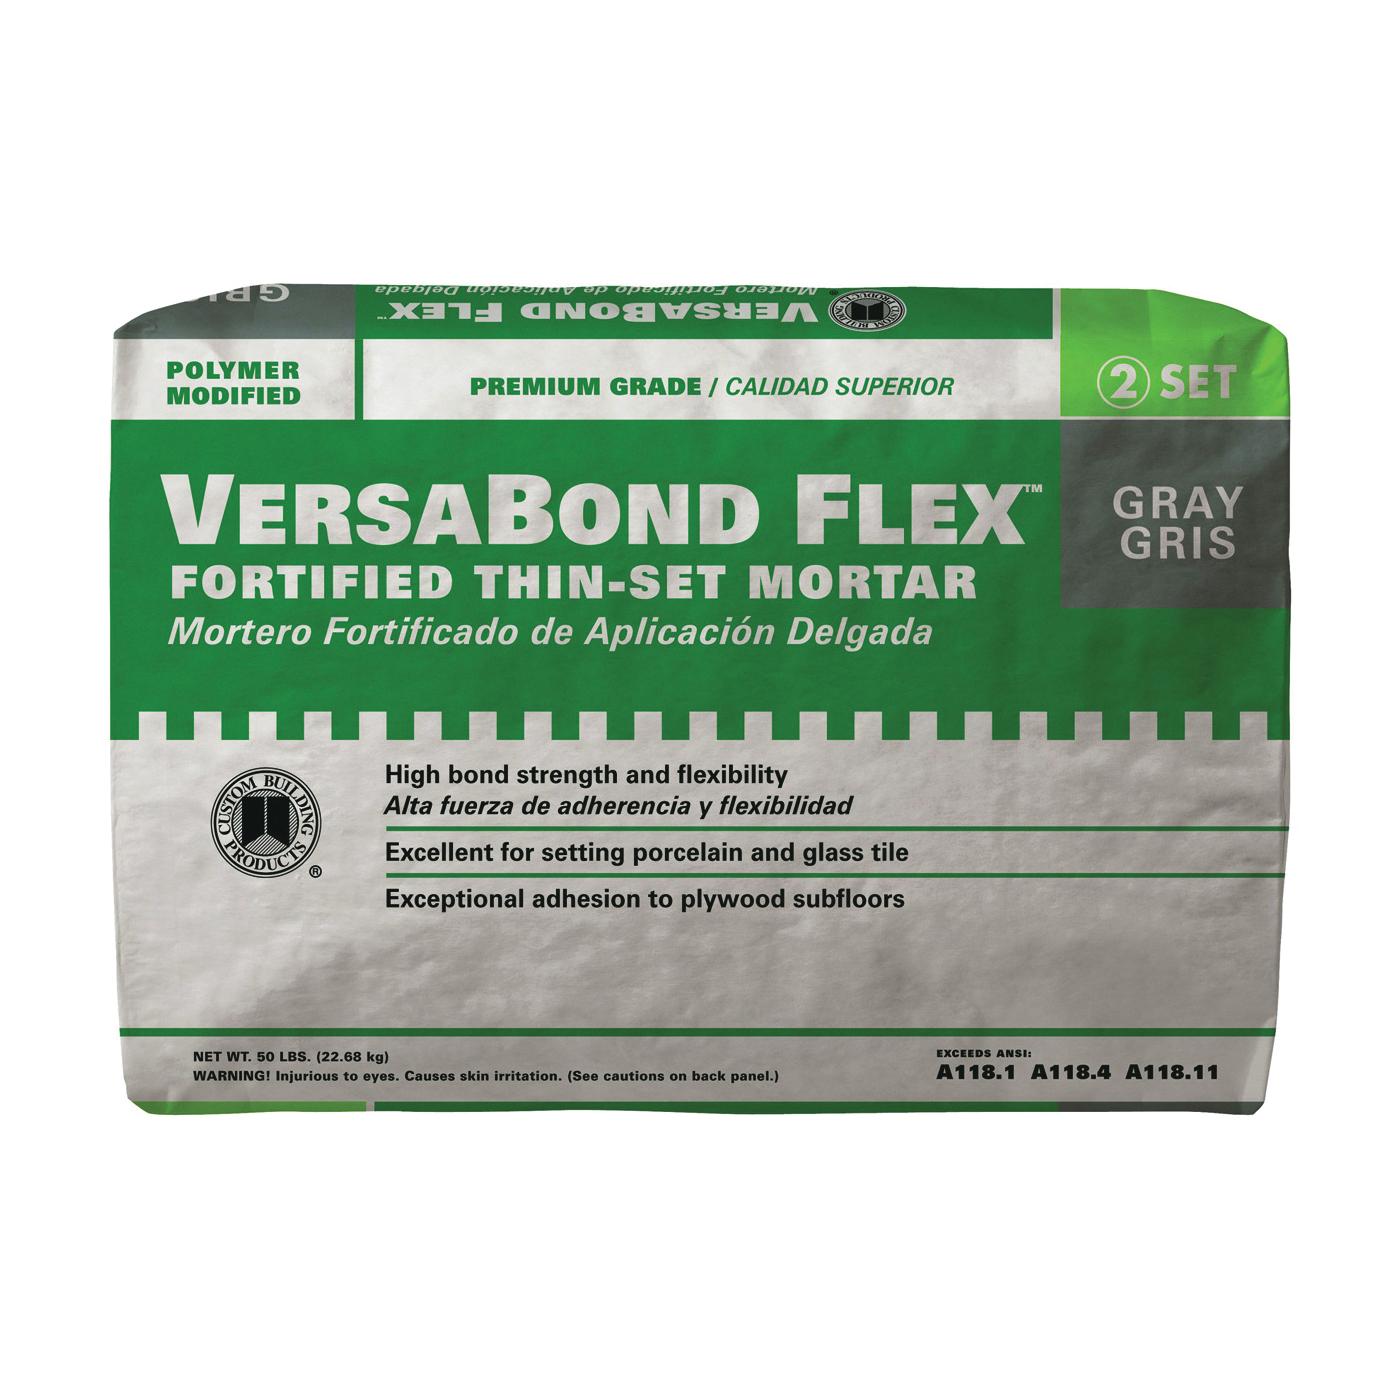 Picture of CUSTOM VersaBond Flex VBFG50 Thin-Set Mortar, Gray, Powder, 50 lb Package, Bag